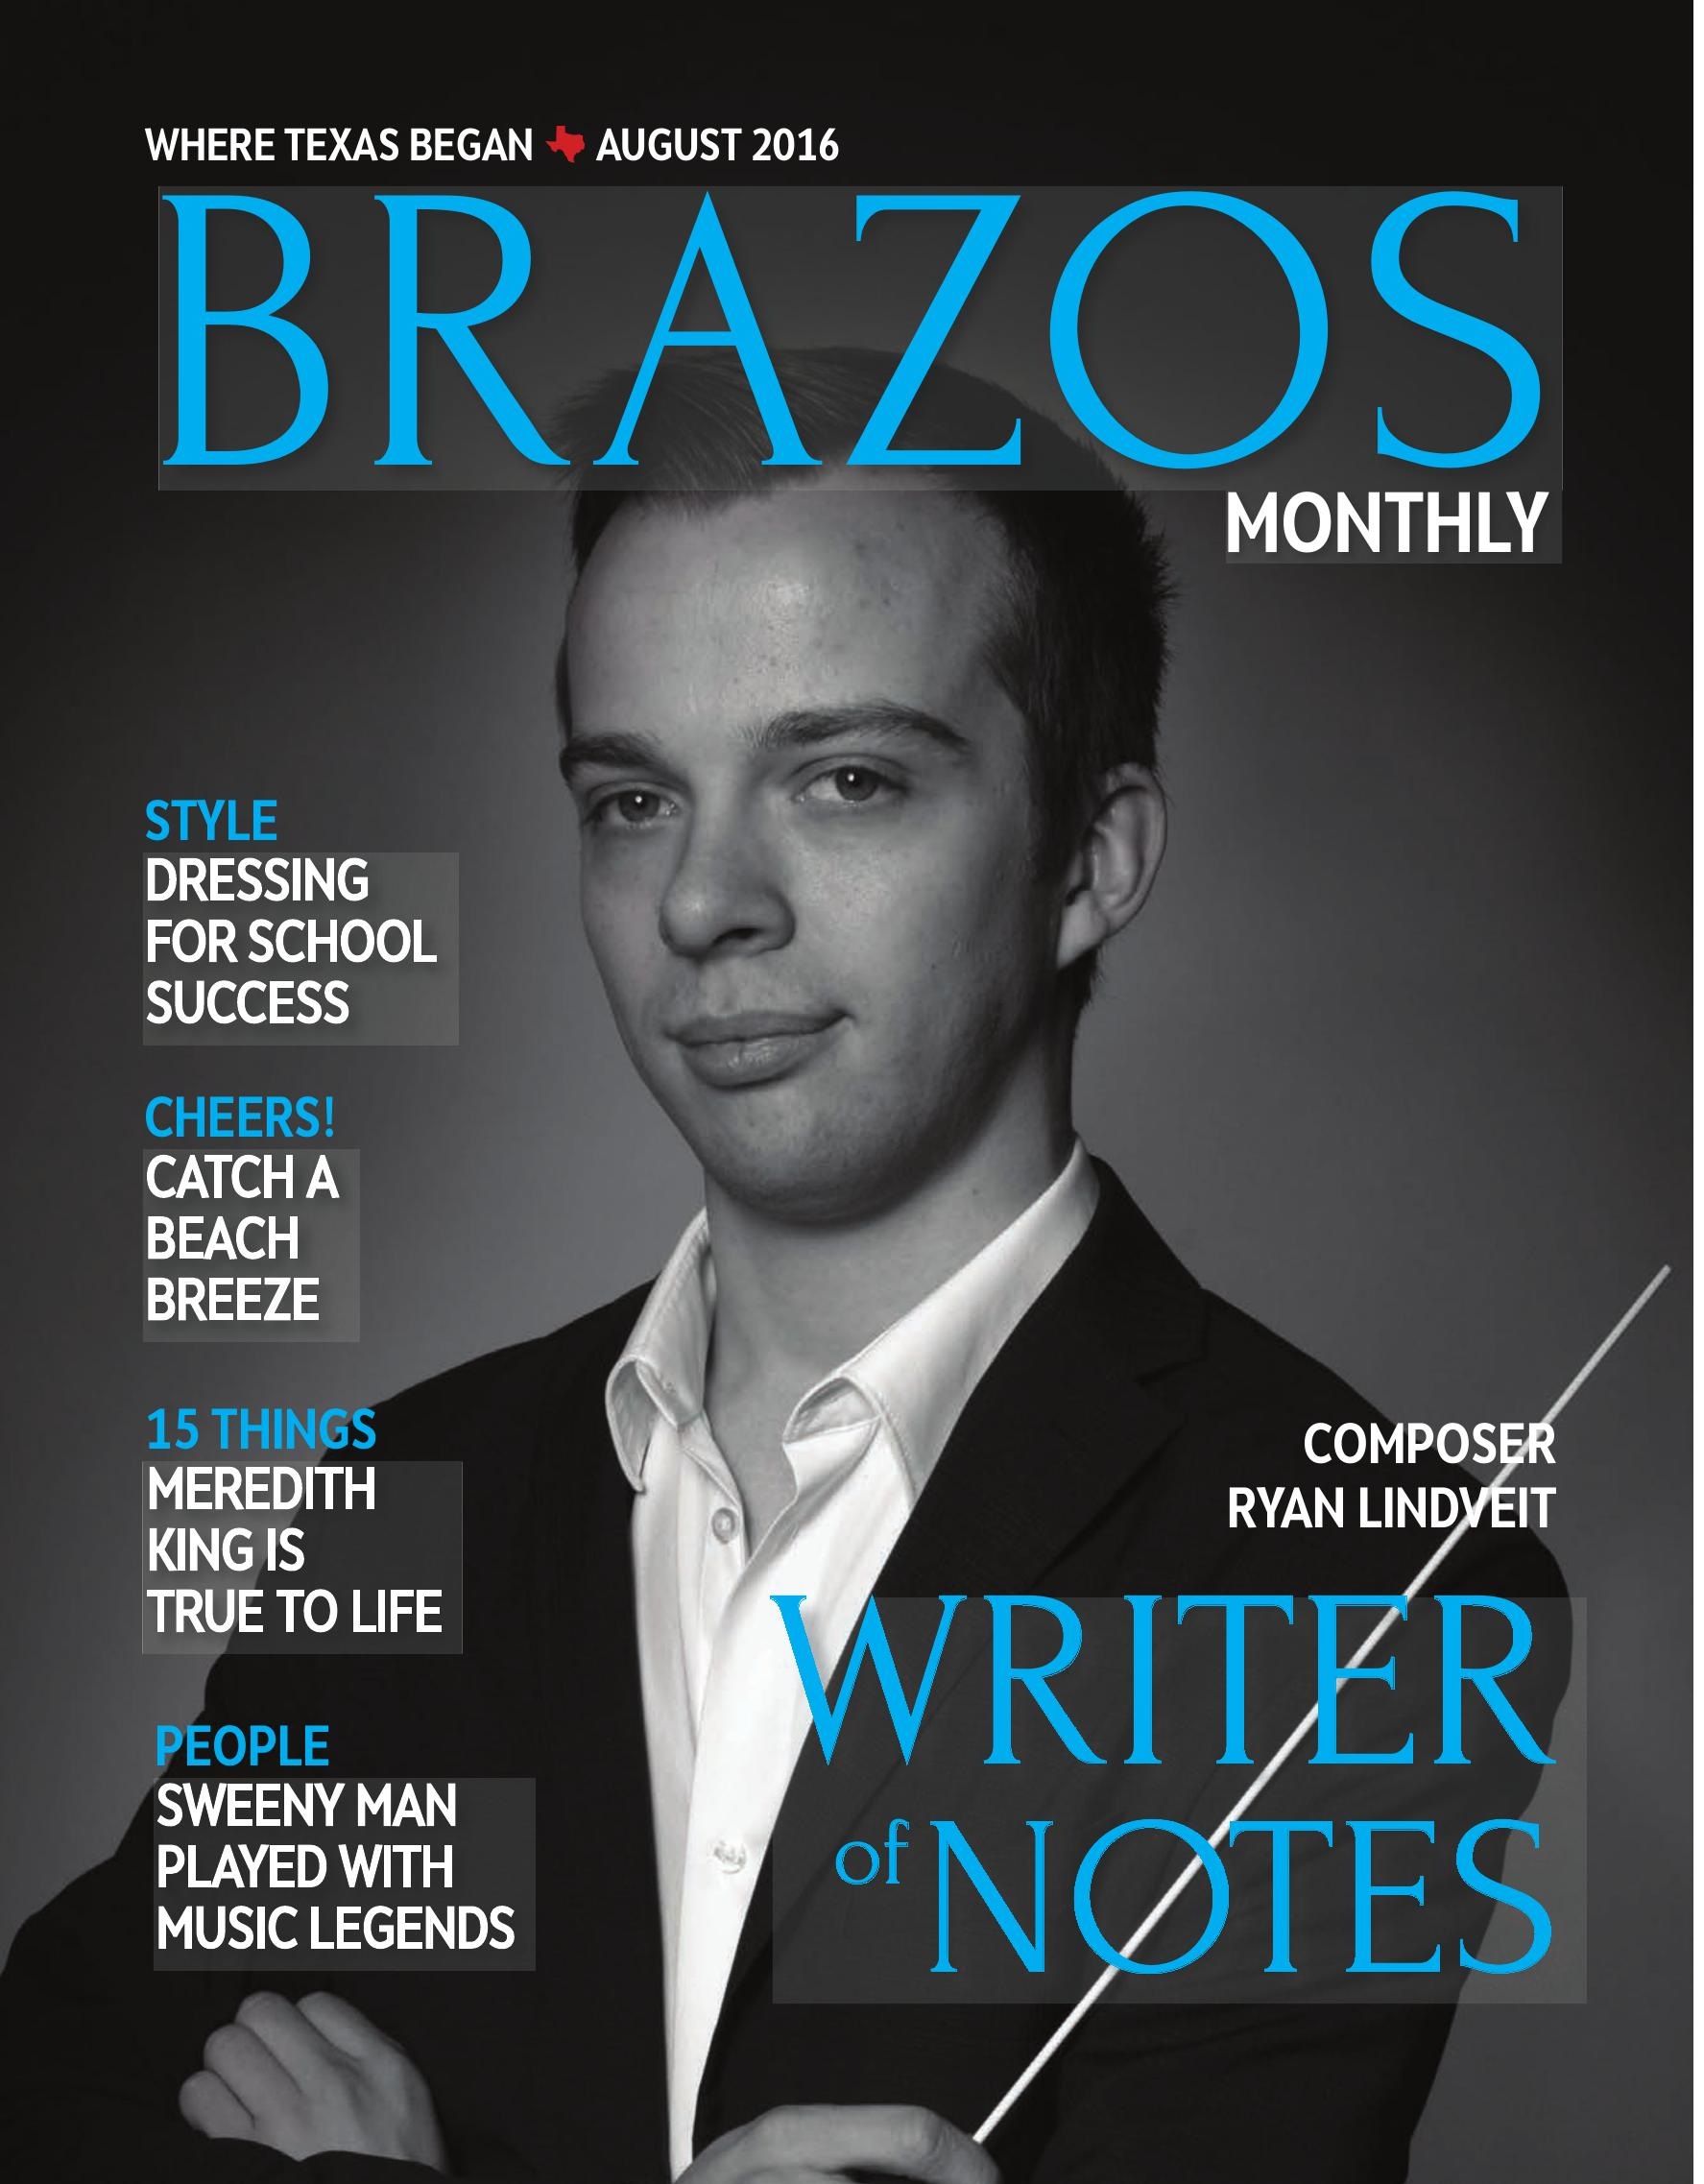 Brazos Monthly Cover.jpg